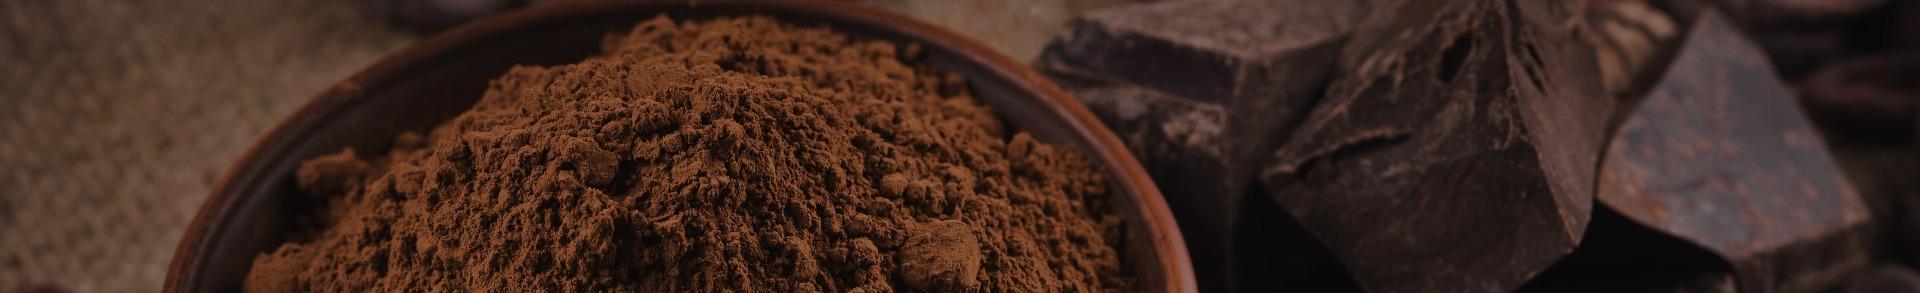 Powdered Chocolate Drink